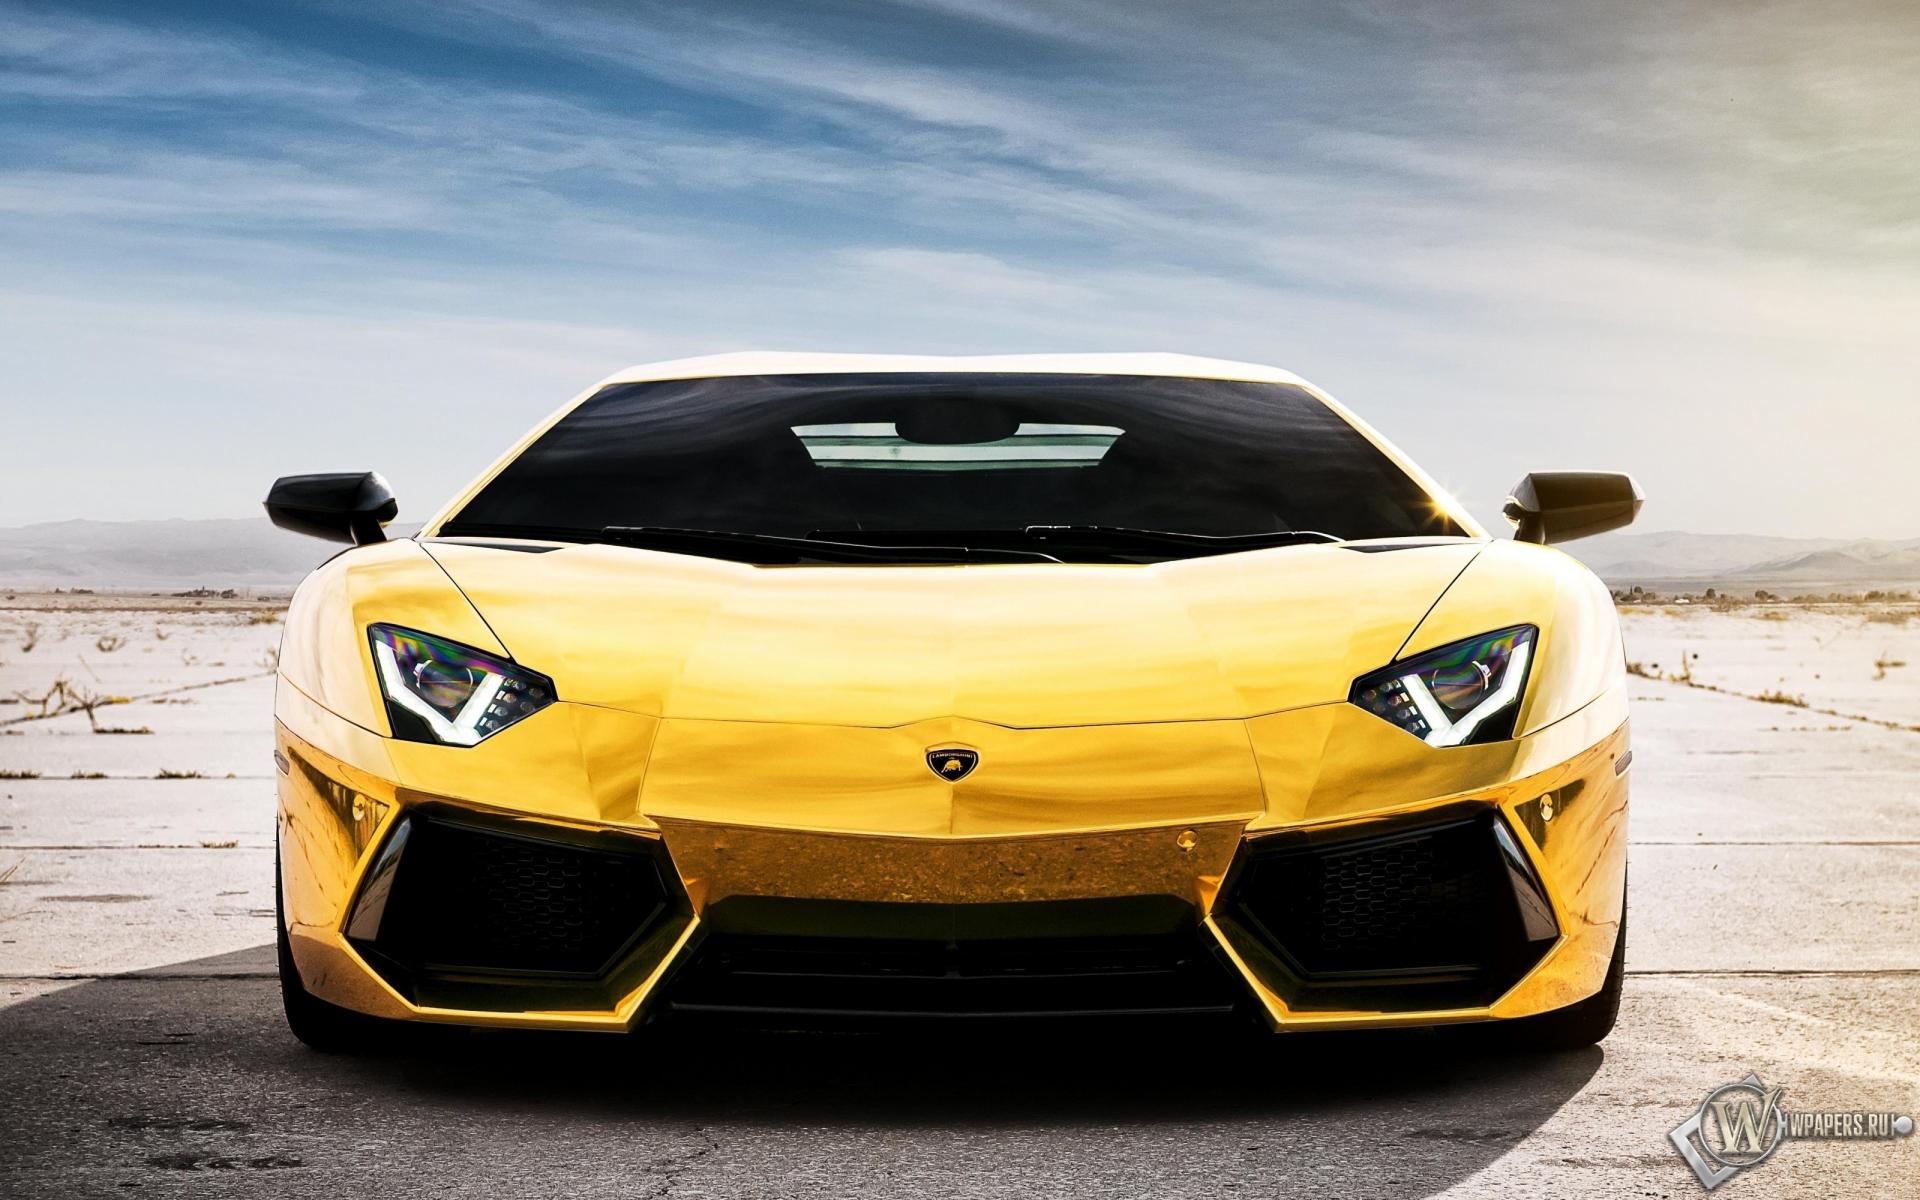 Mustang Dorado >> Gold And Black Lamborghini Wallpaper 6 Cool Hd Wallpaper - Hdblackwallpaper.com